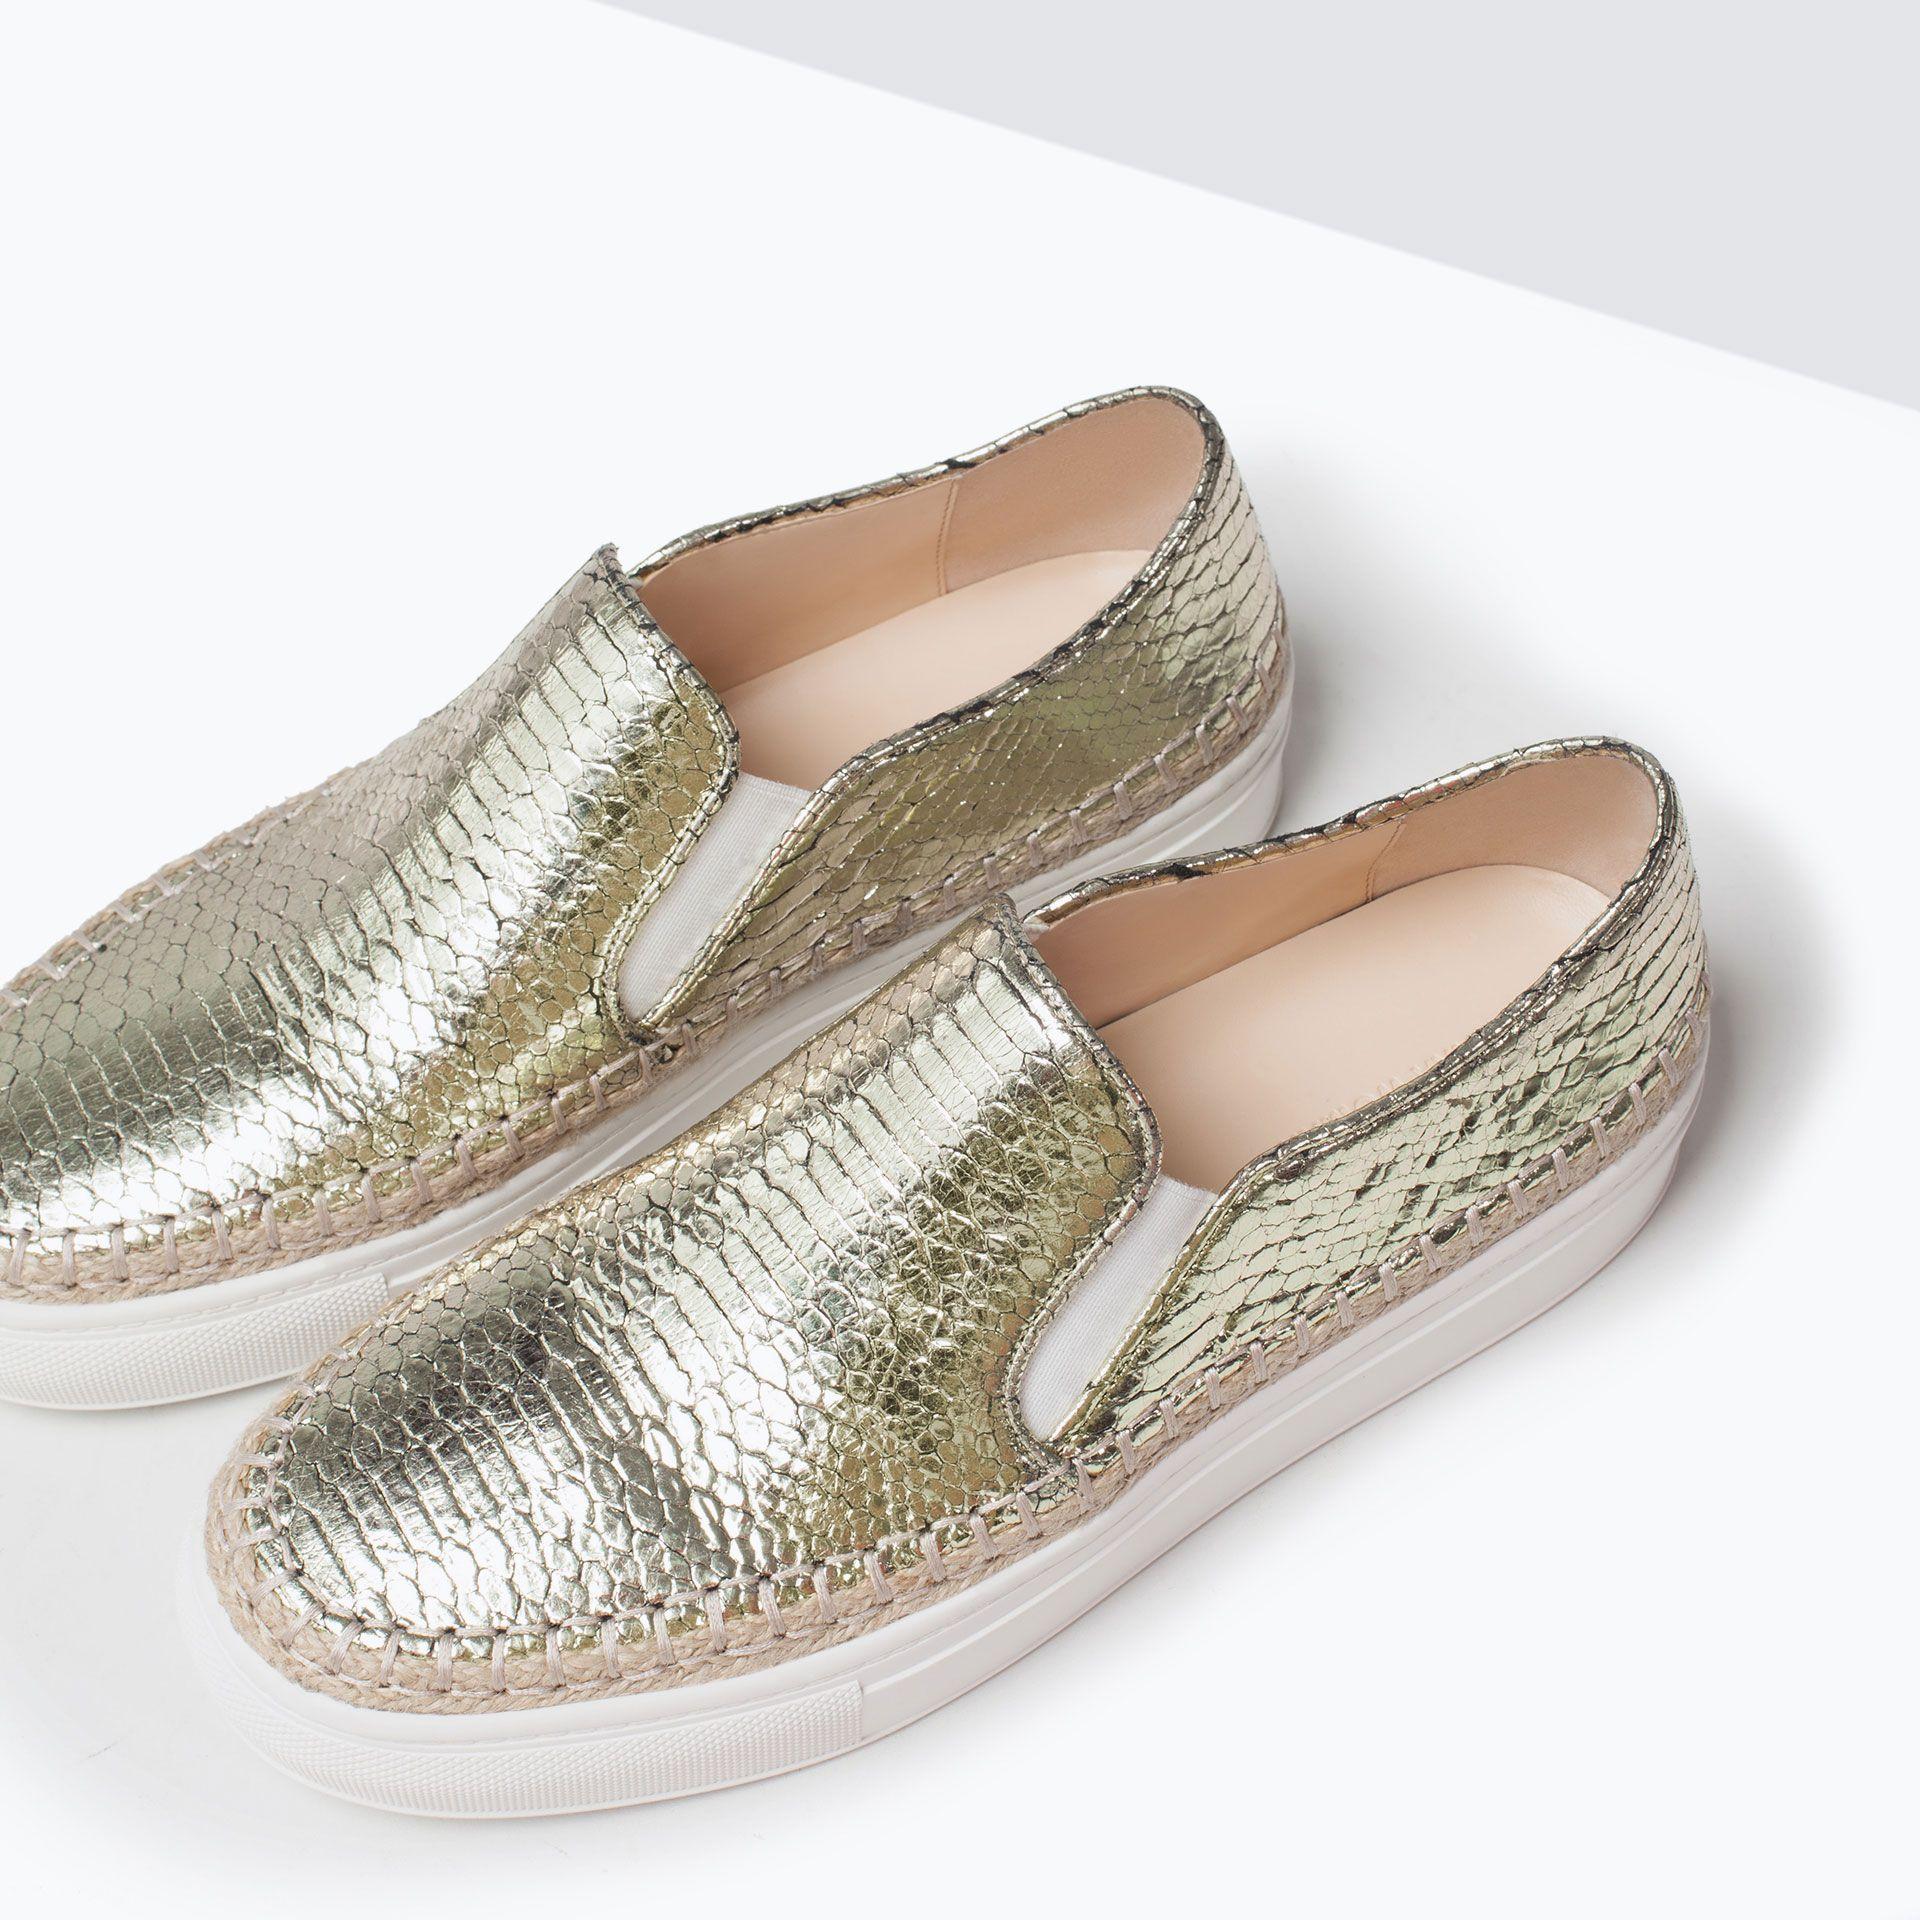 84eeeb682 TENNIS EN CUIR GRAVÉ - Chaussures - FEMME | ZARA France | shopping ...